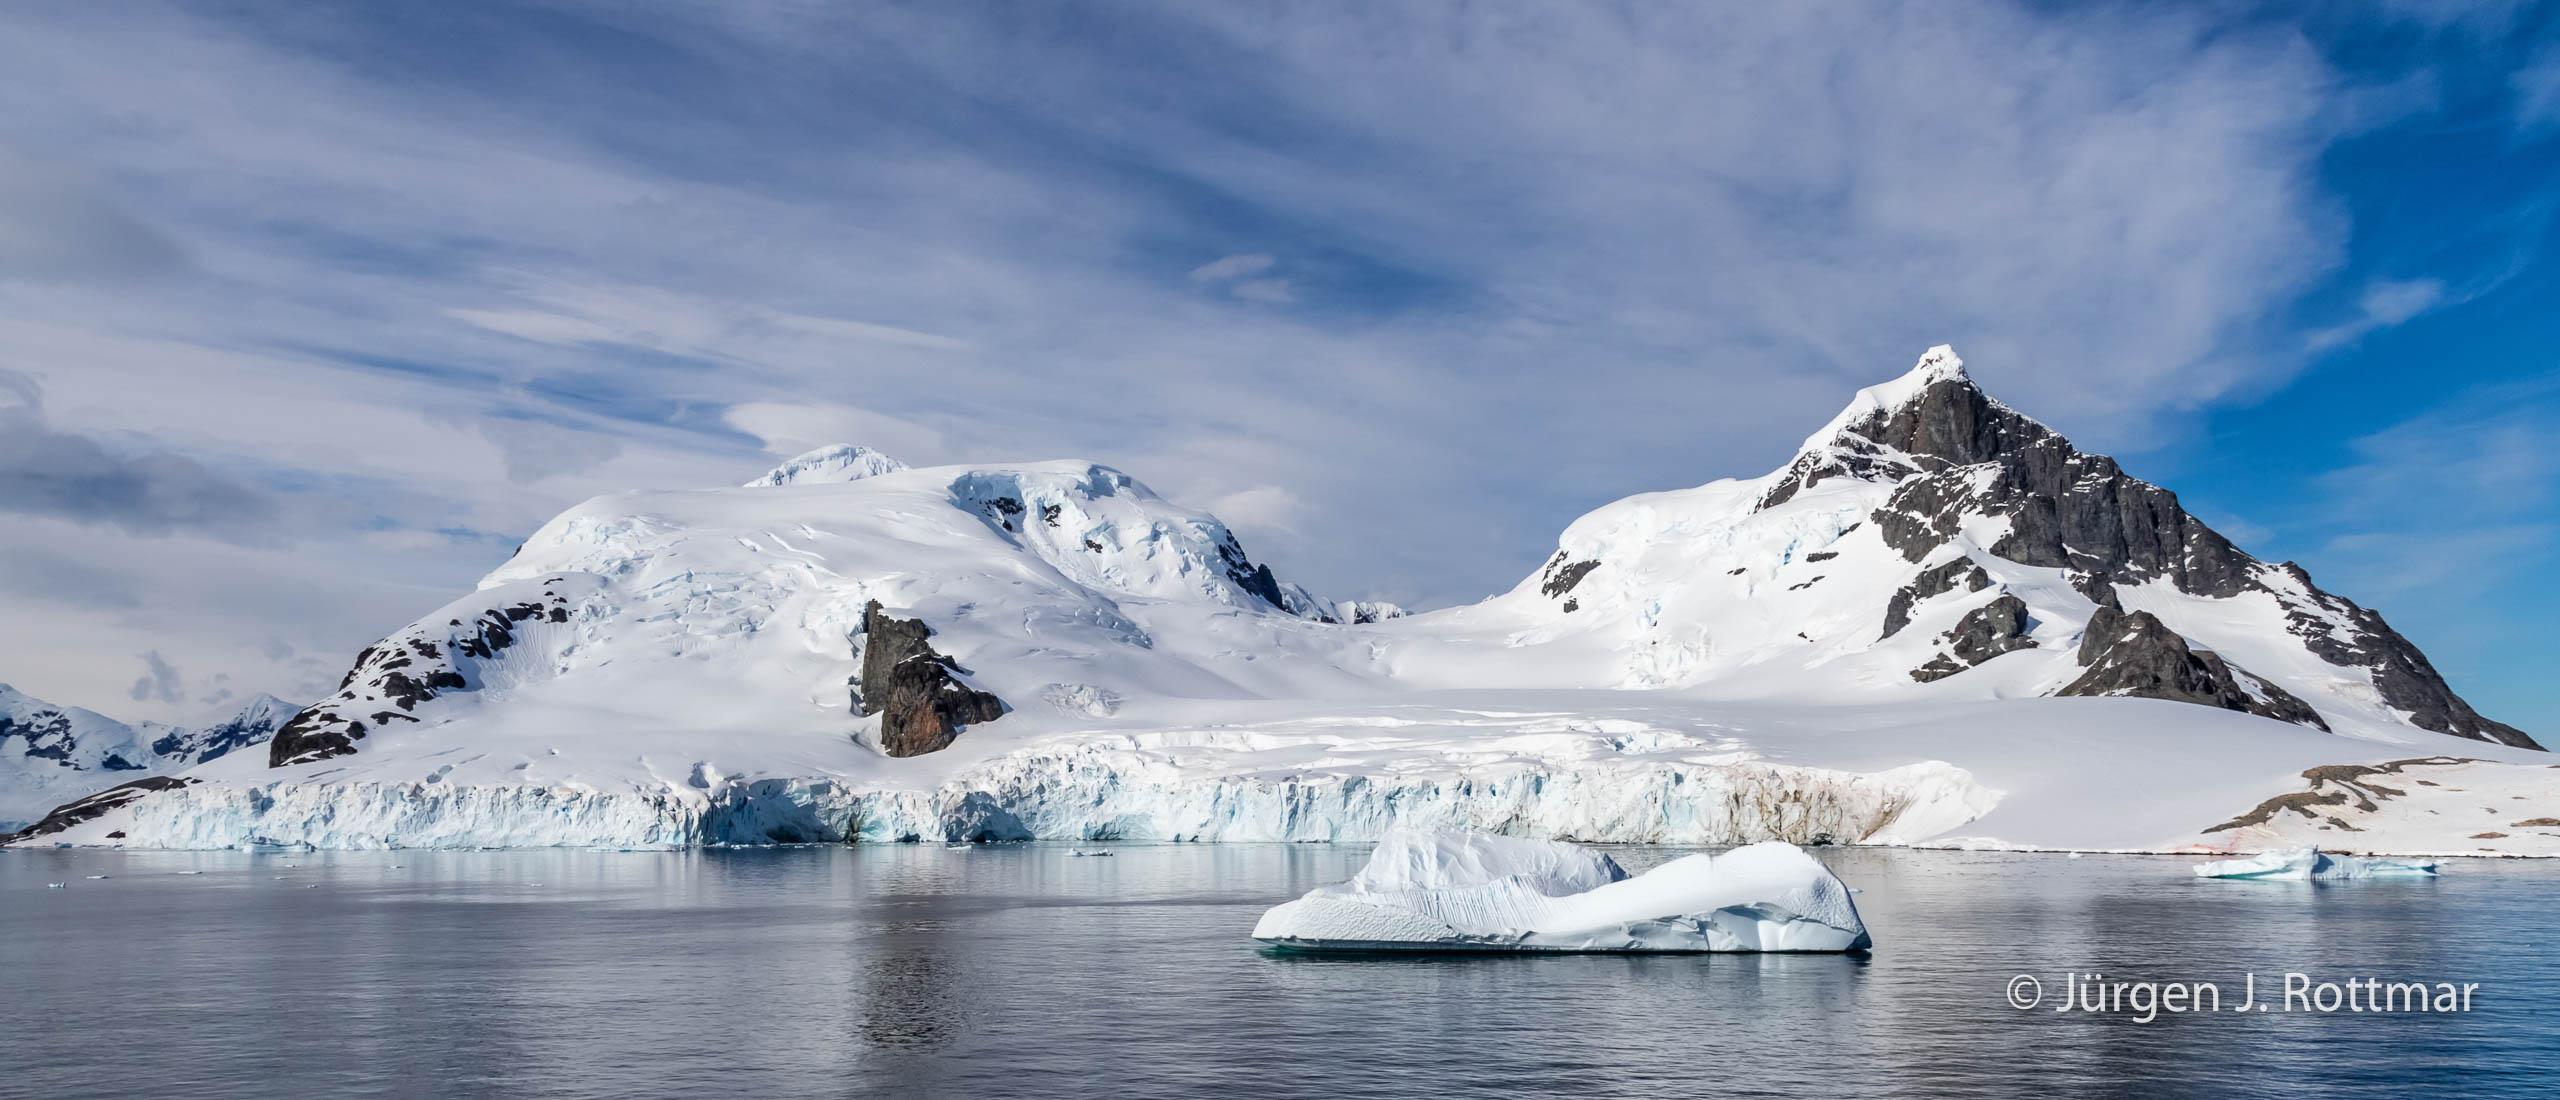 Juergen J Rottmar Antarctica M2I1141 Bearbeitet